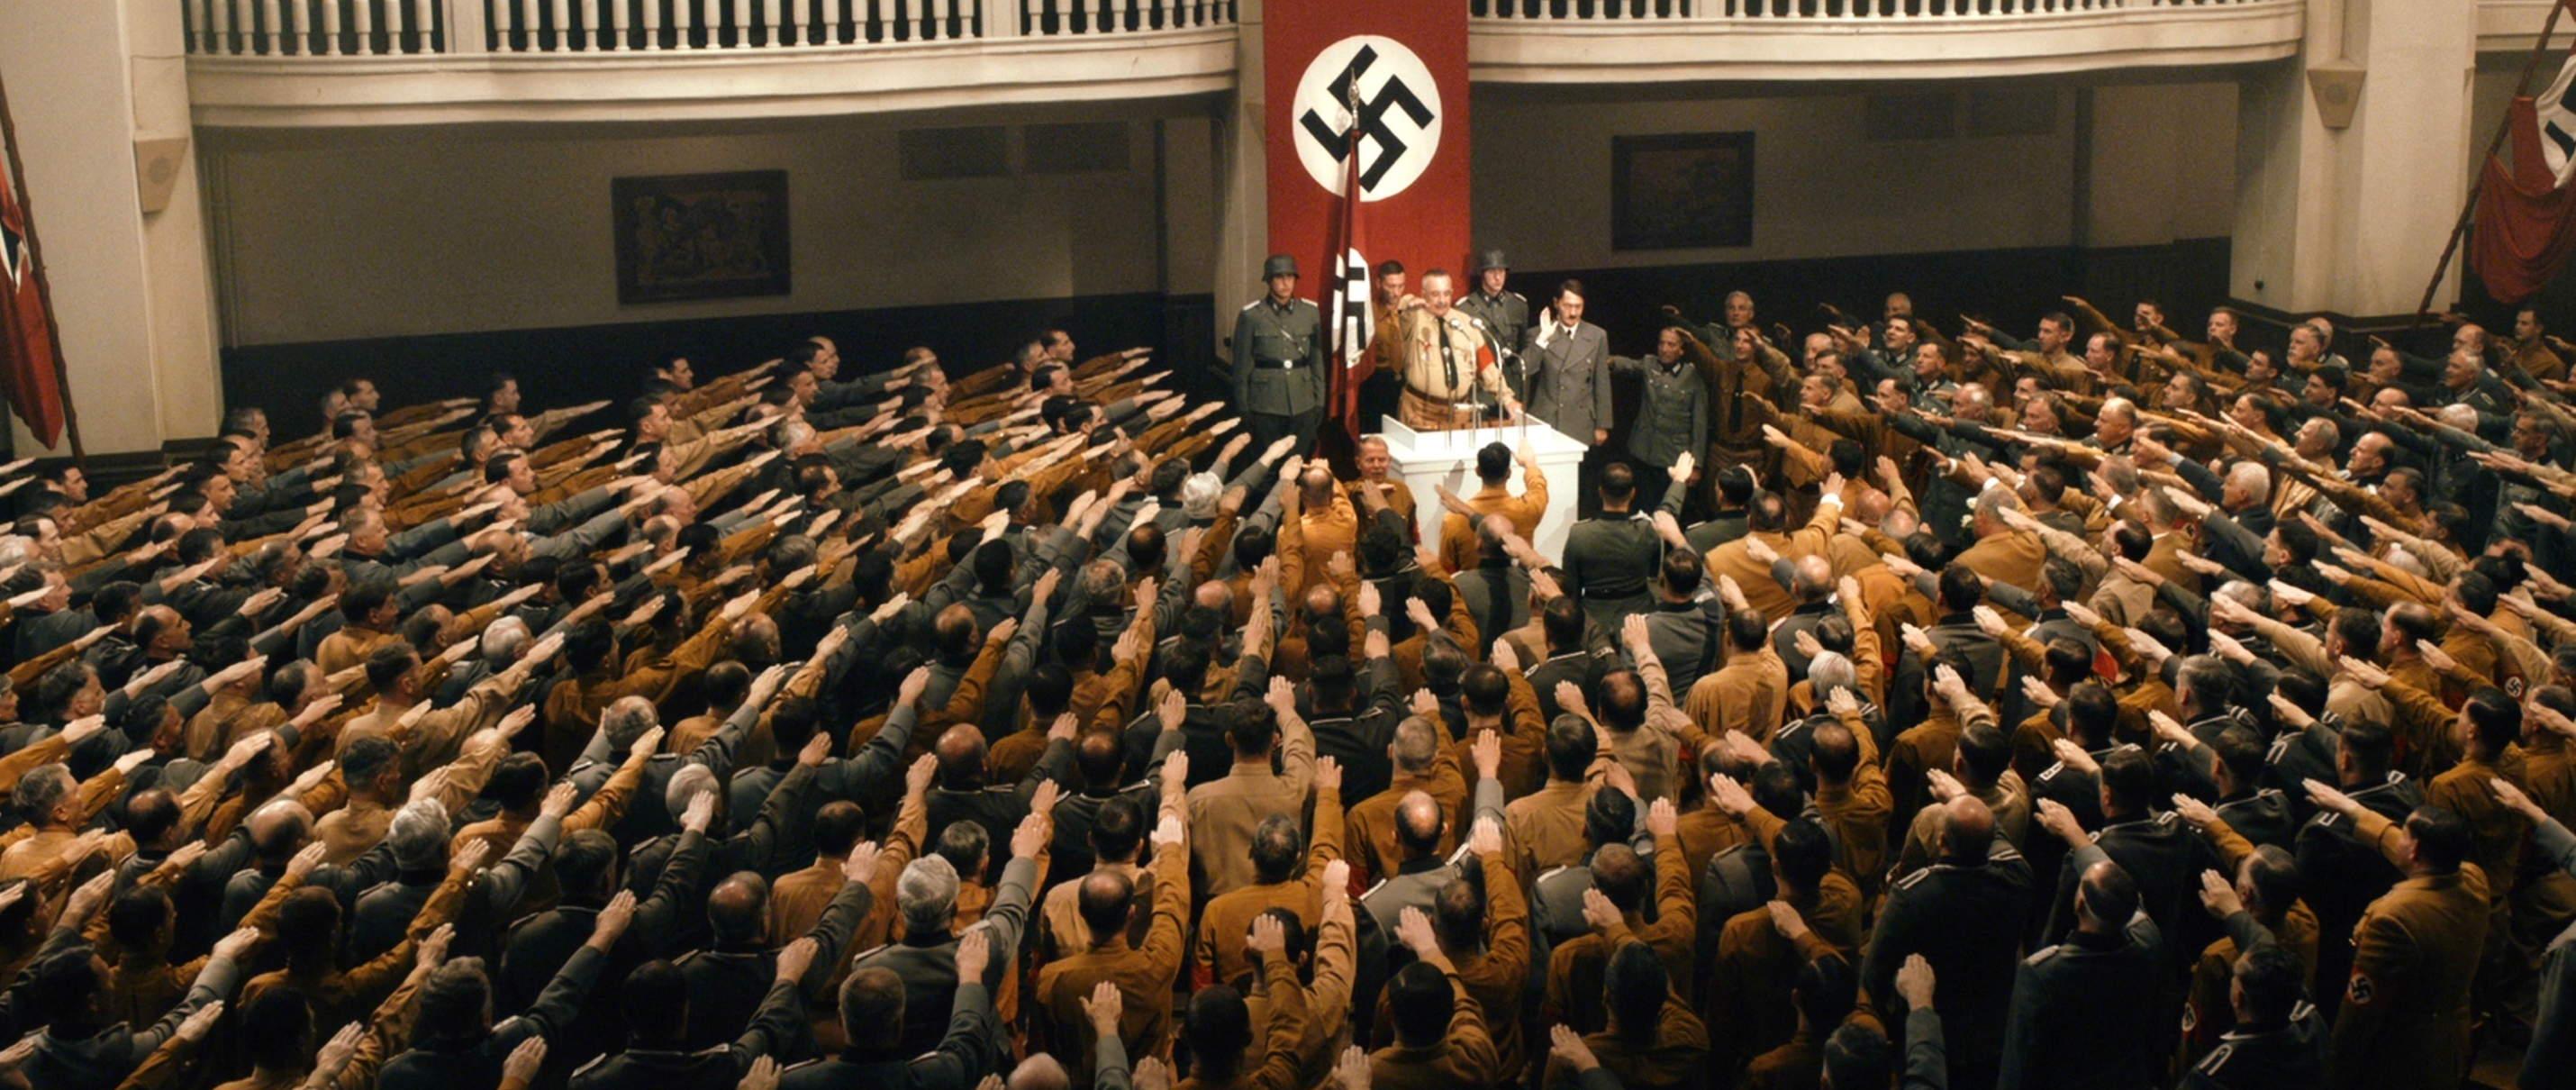 Elser - 13 Minutes - Hitler hält eine Rede - Regie Oliver Hirschbiegel - Kamera Judith Kaufmann